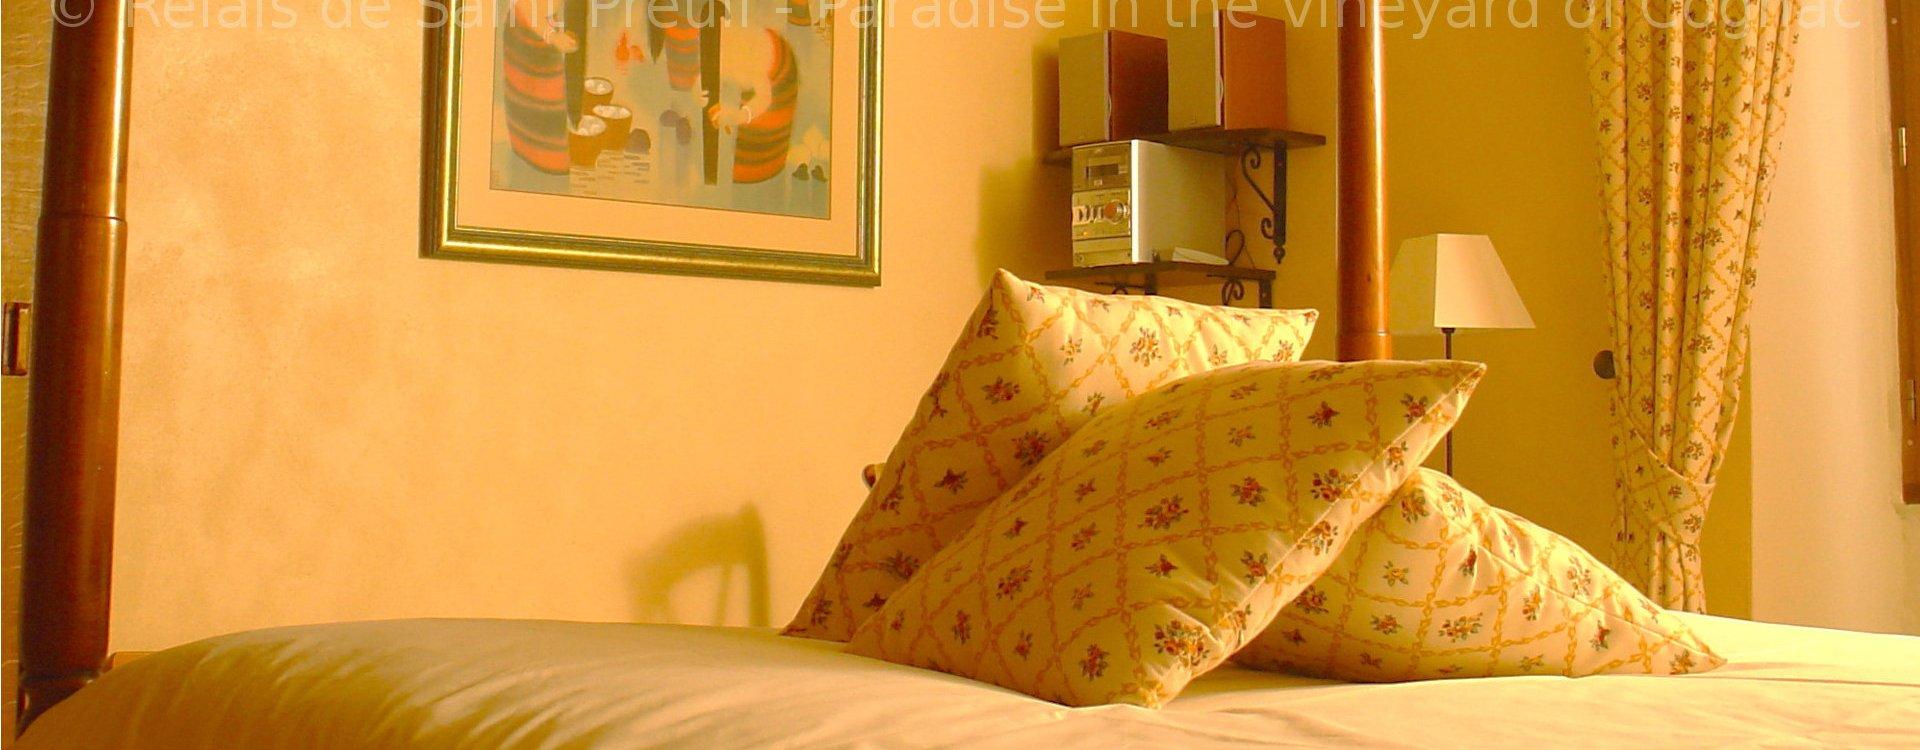 Hofbrau 404 Location Parivate Motel Dvp Dating Upscale